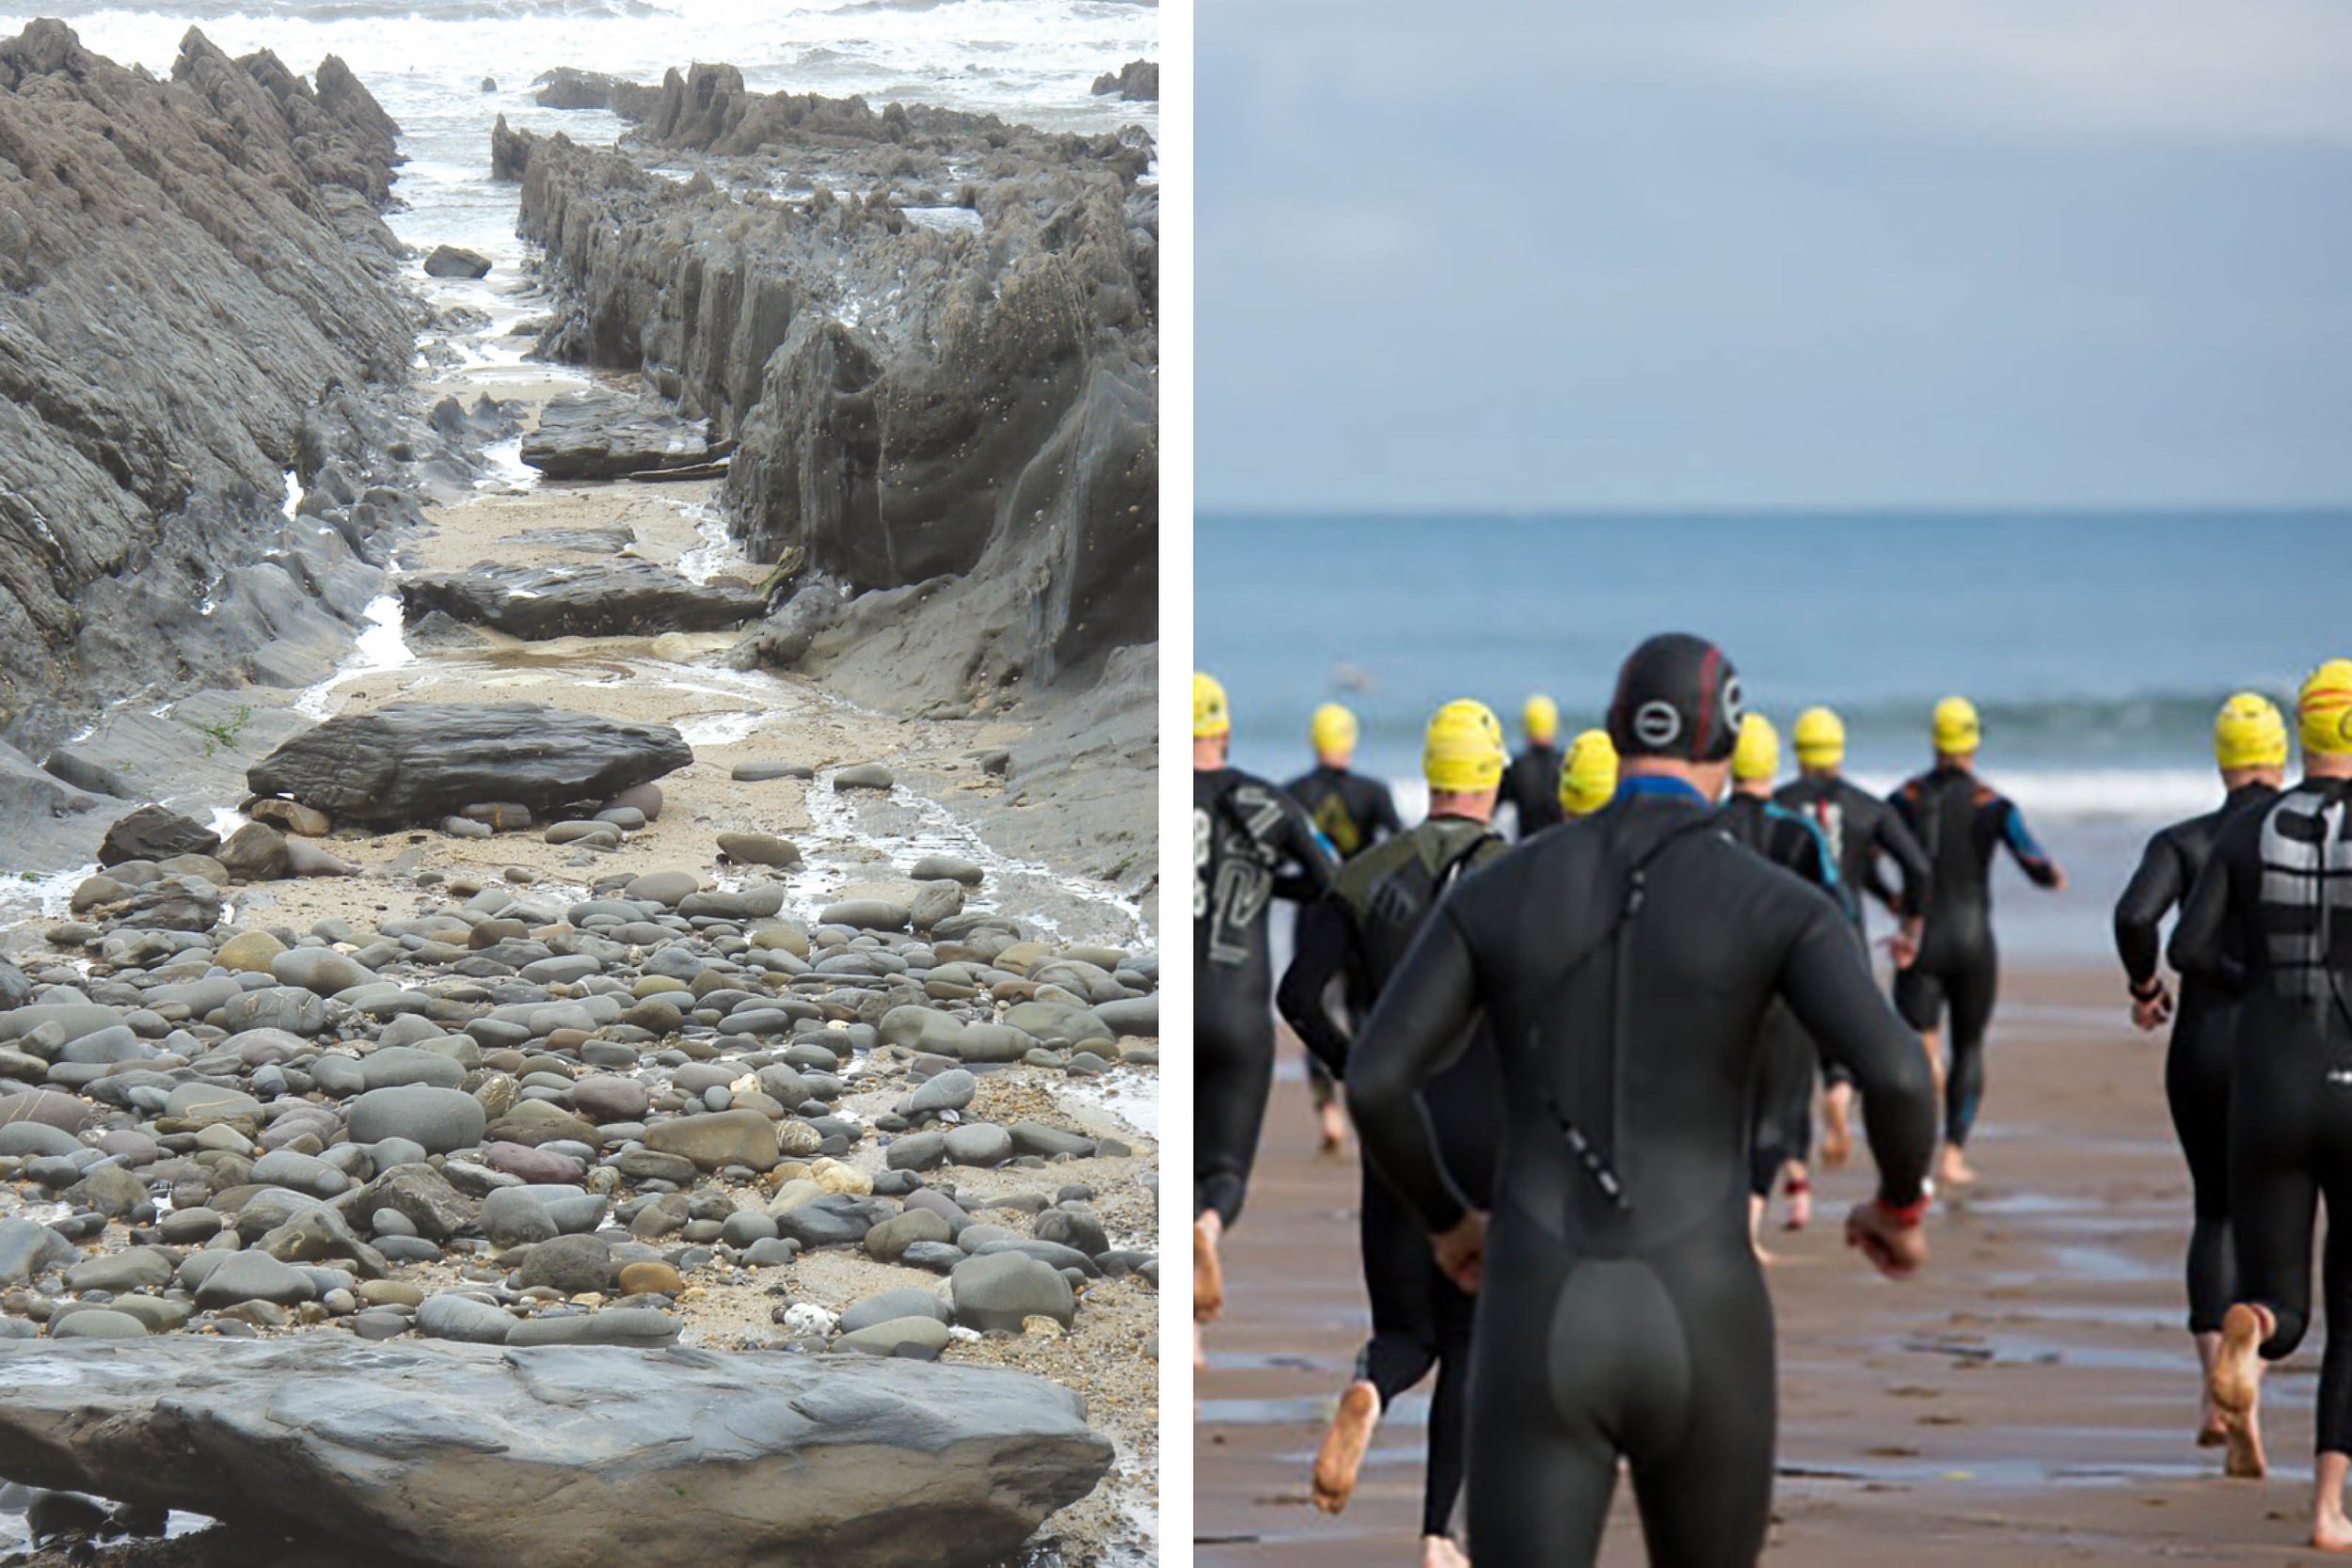 The north Devon coast, rock pools and surfers